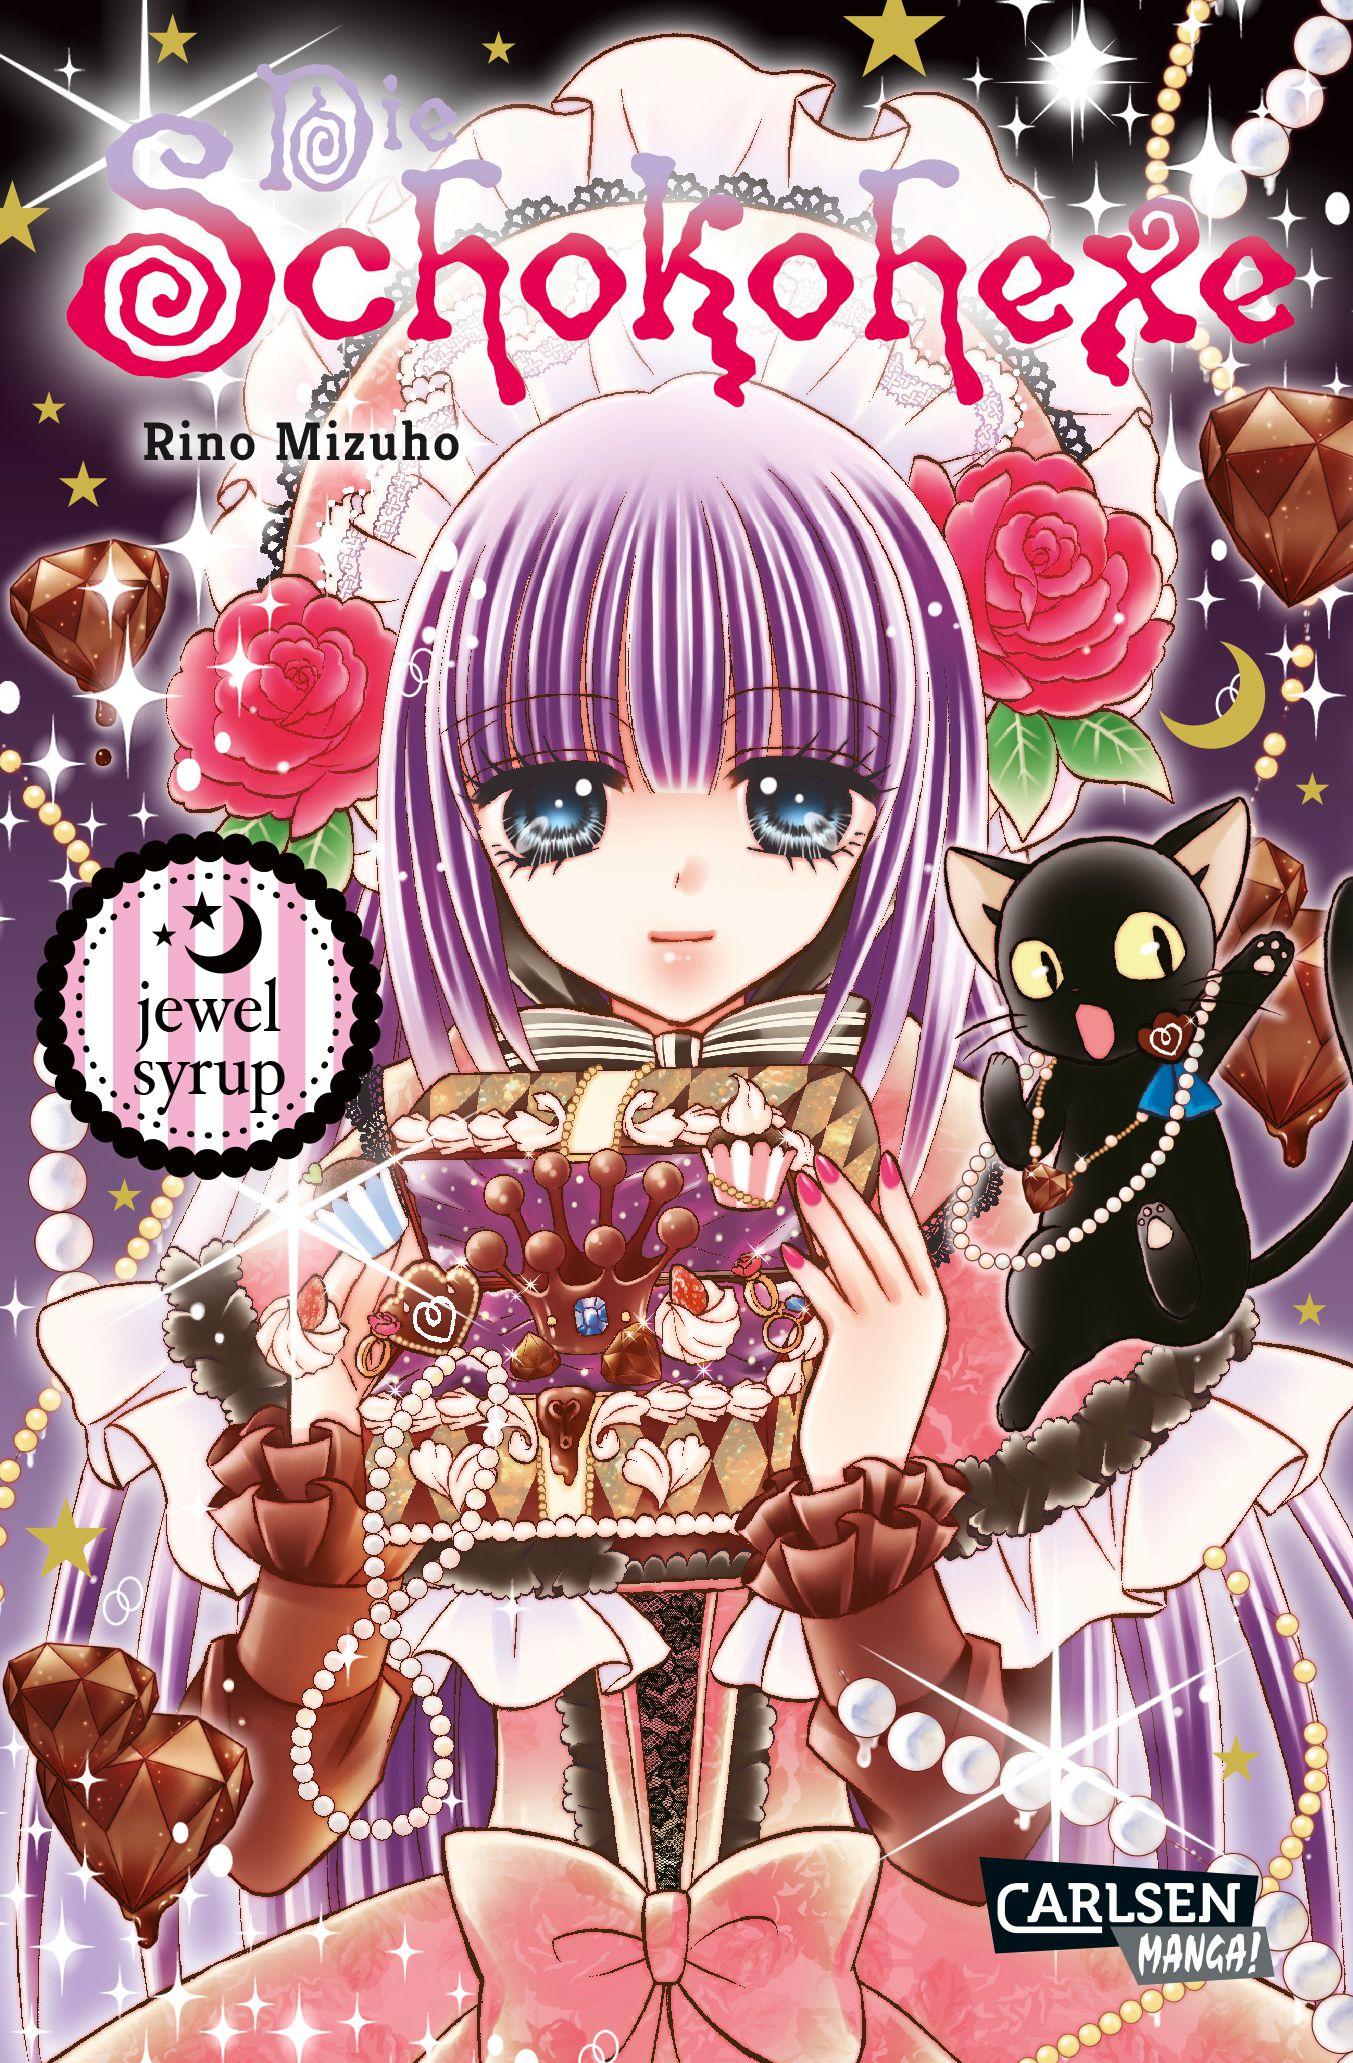 Die Schokohexe 10. Jewel Syrup Rino Mizuho